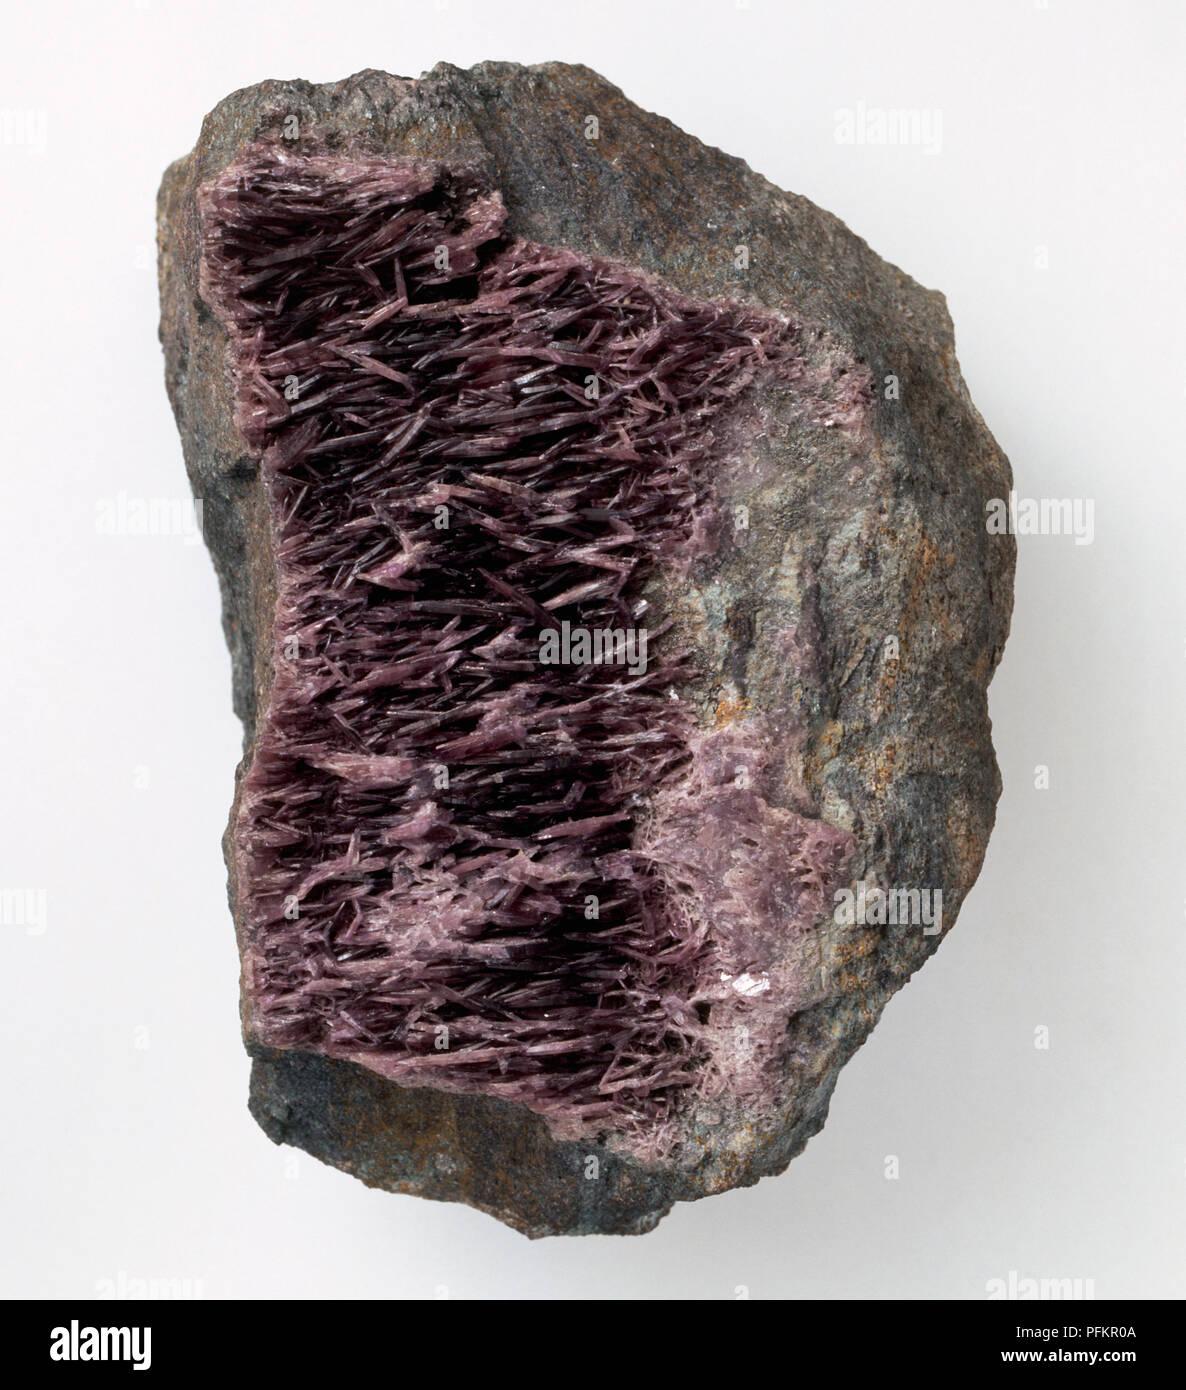 Diaspore crystals in emery groundmass, close-up - Stock Image